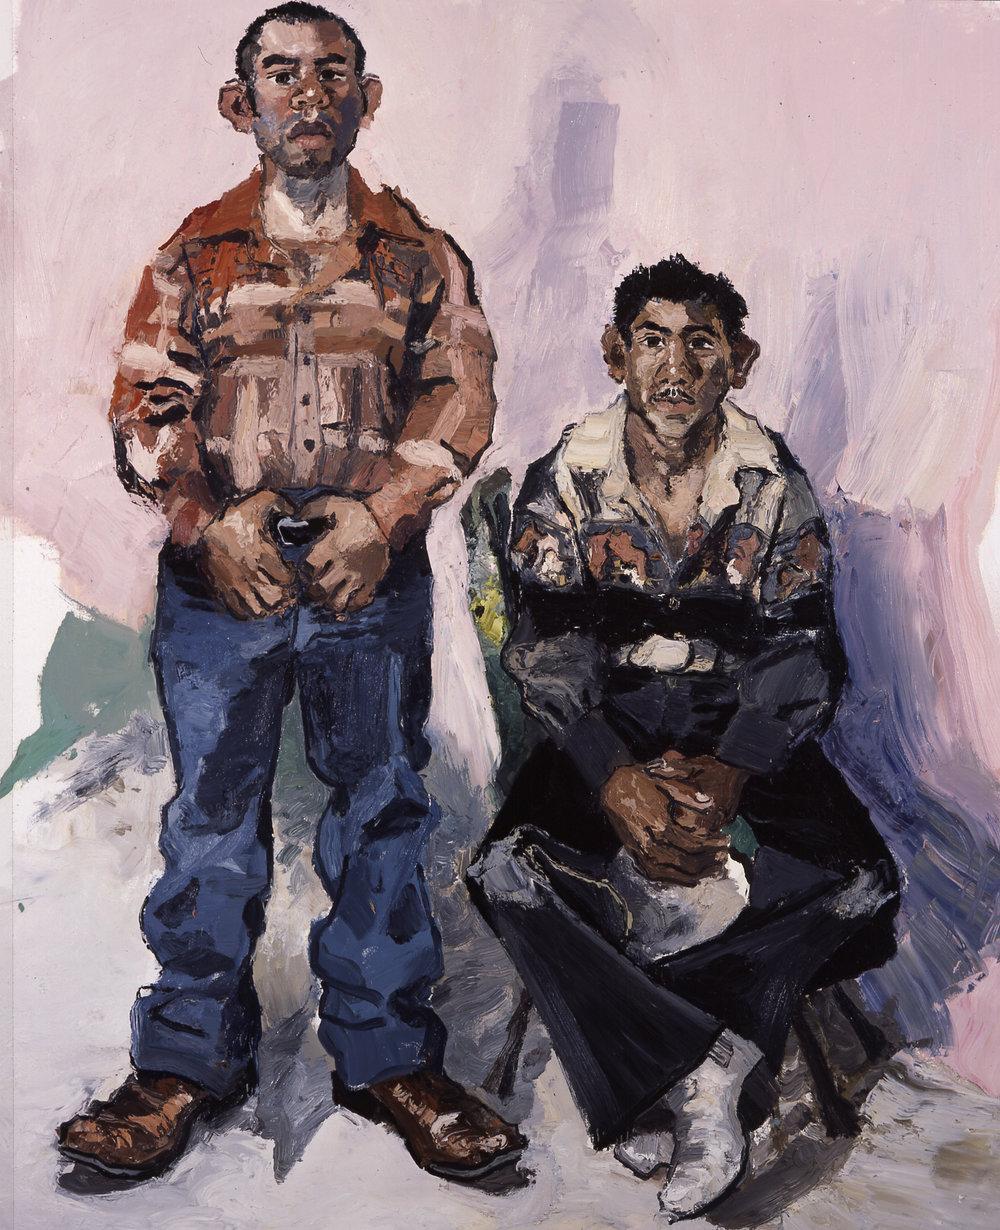 Gabriel and Fernando  2004, Oil on canvas  72 x 60 inches